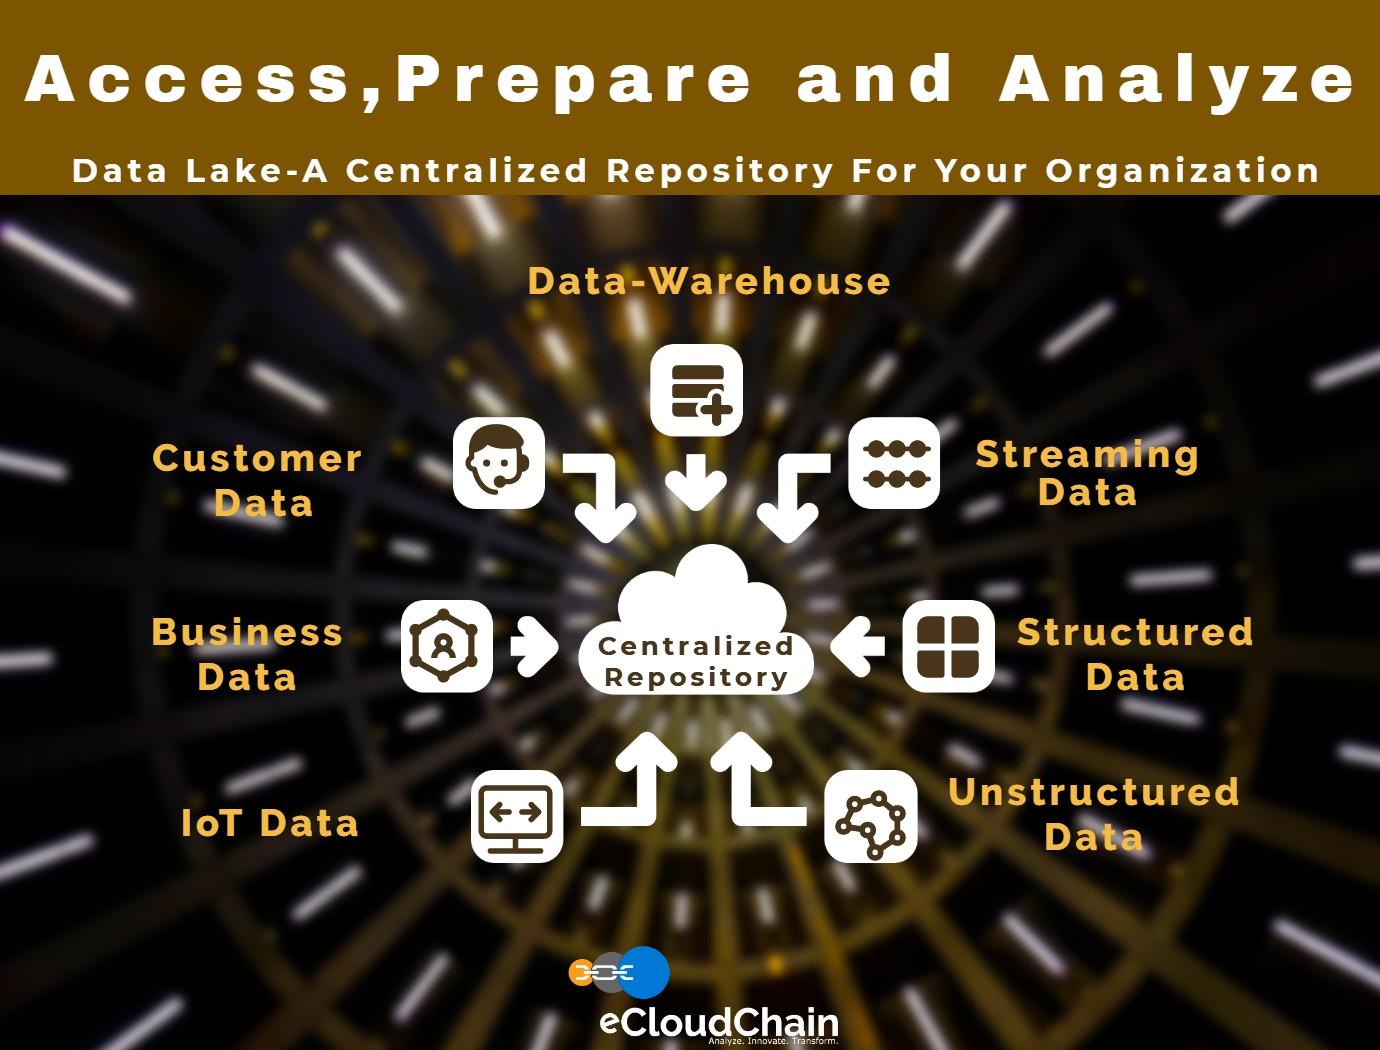 eCloudChain Data-Lake Solutions